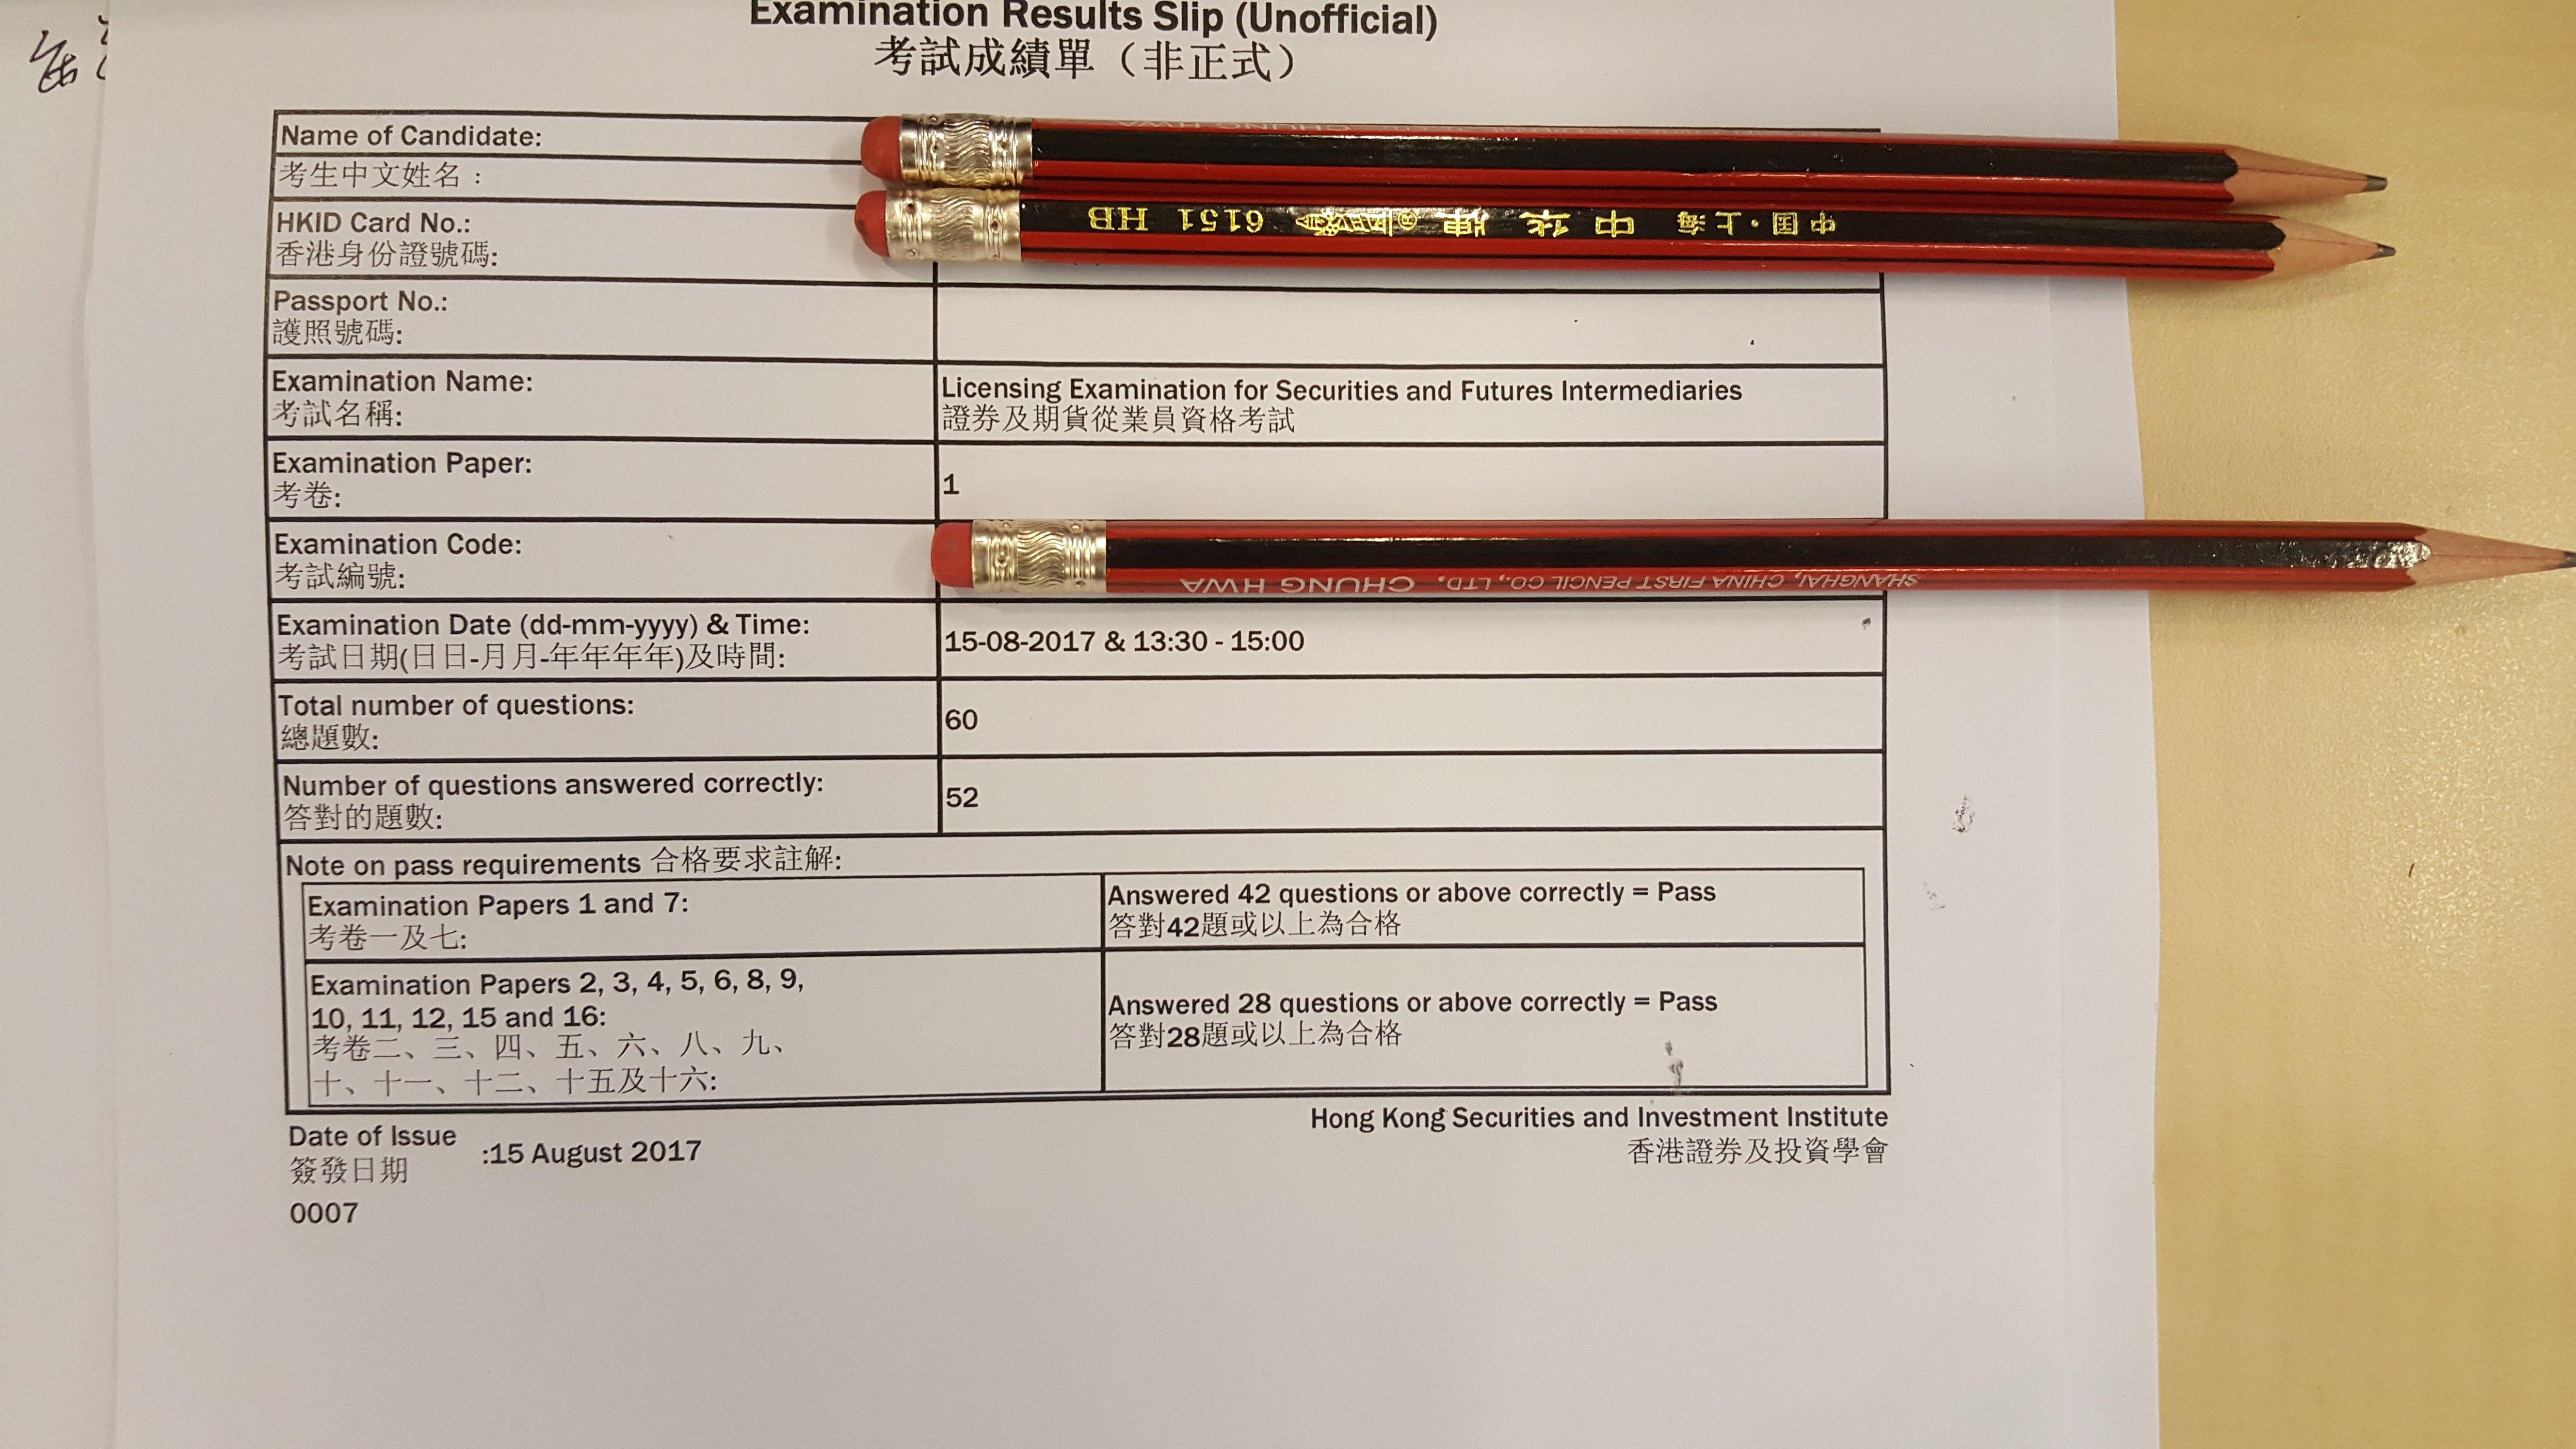 TTXXRSH 15/8/2017 LE Paper 1 證券期貨從業員資格考試卷一 Pass